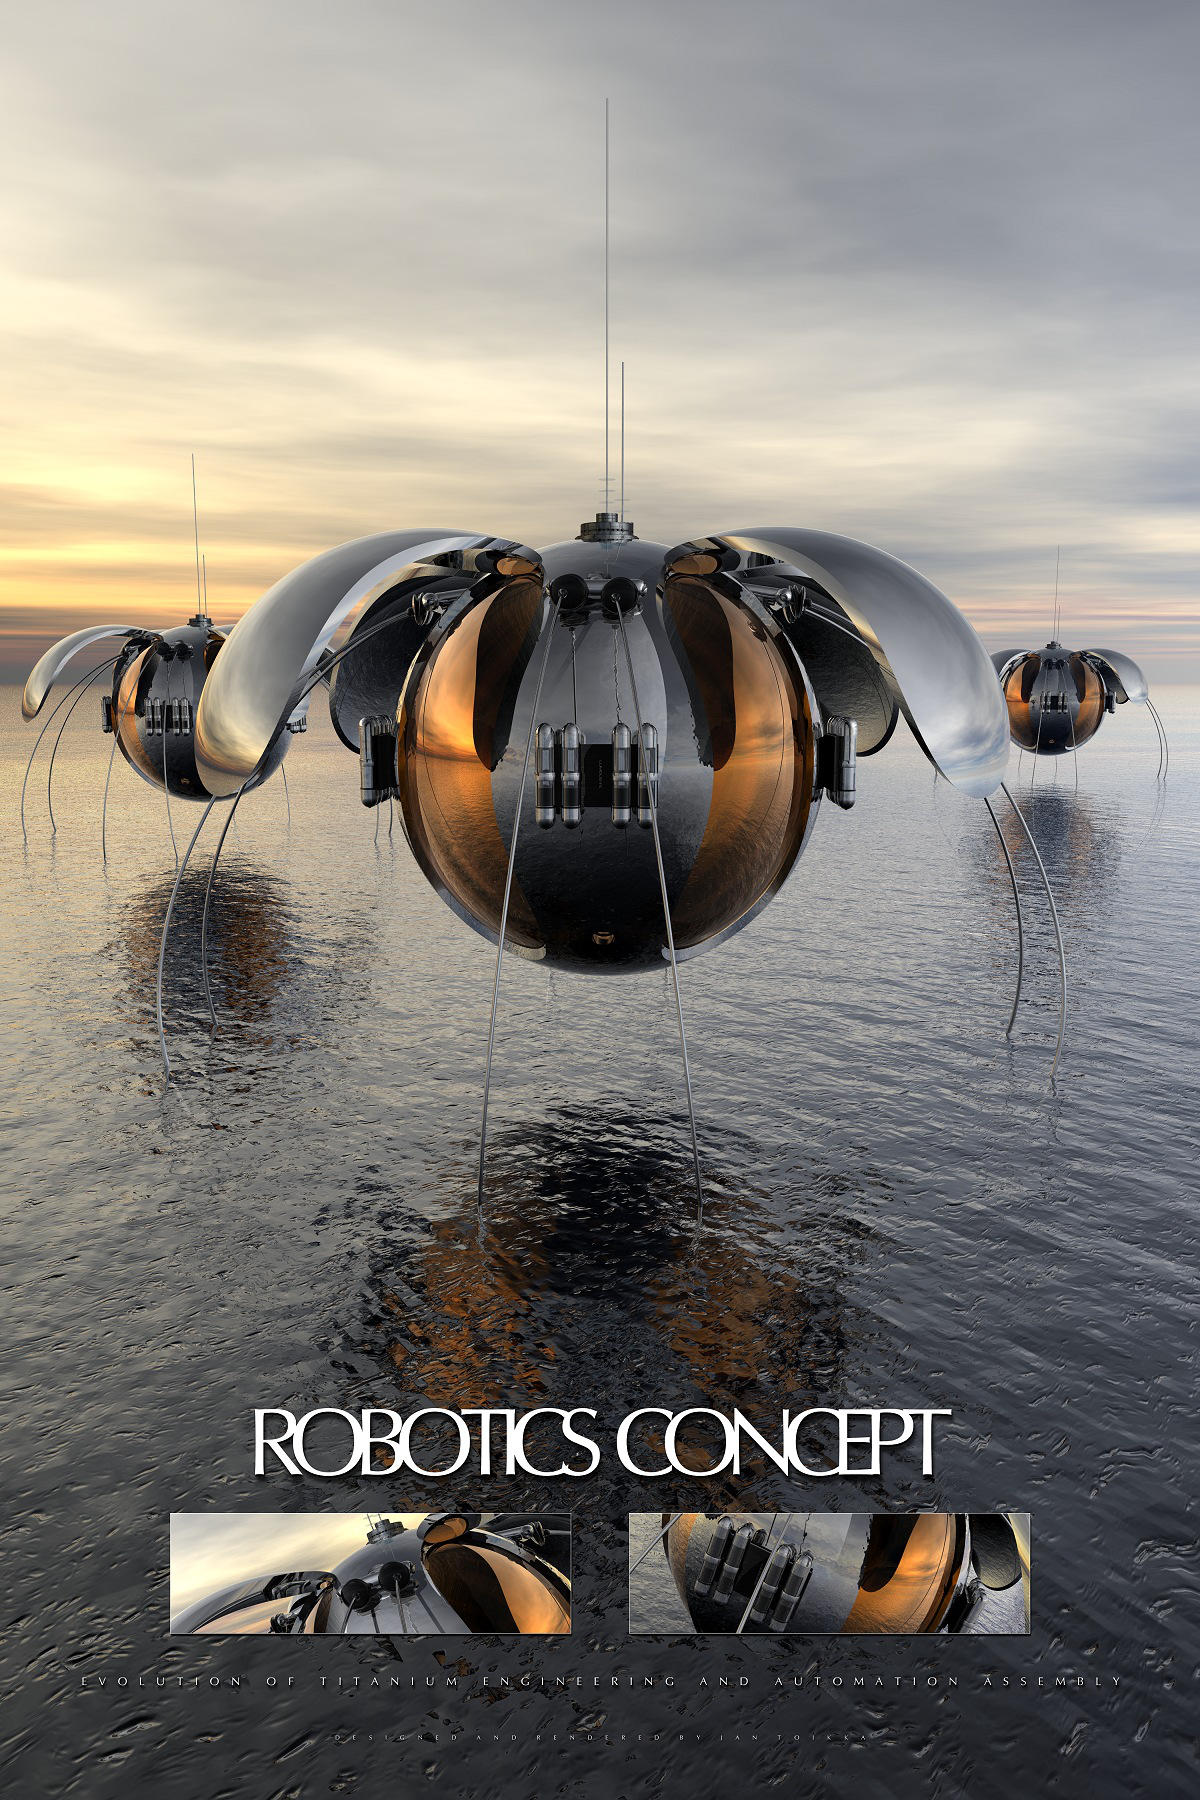 robotics concept by lumous